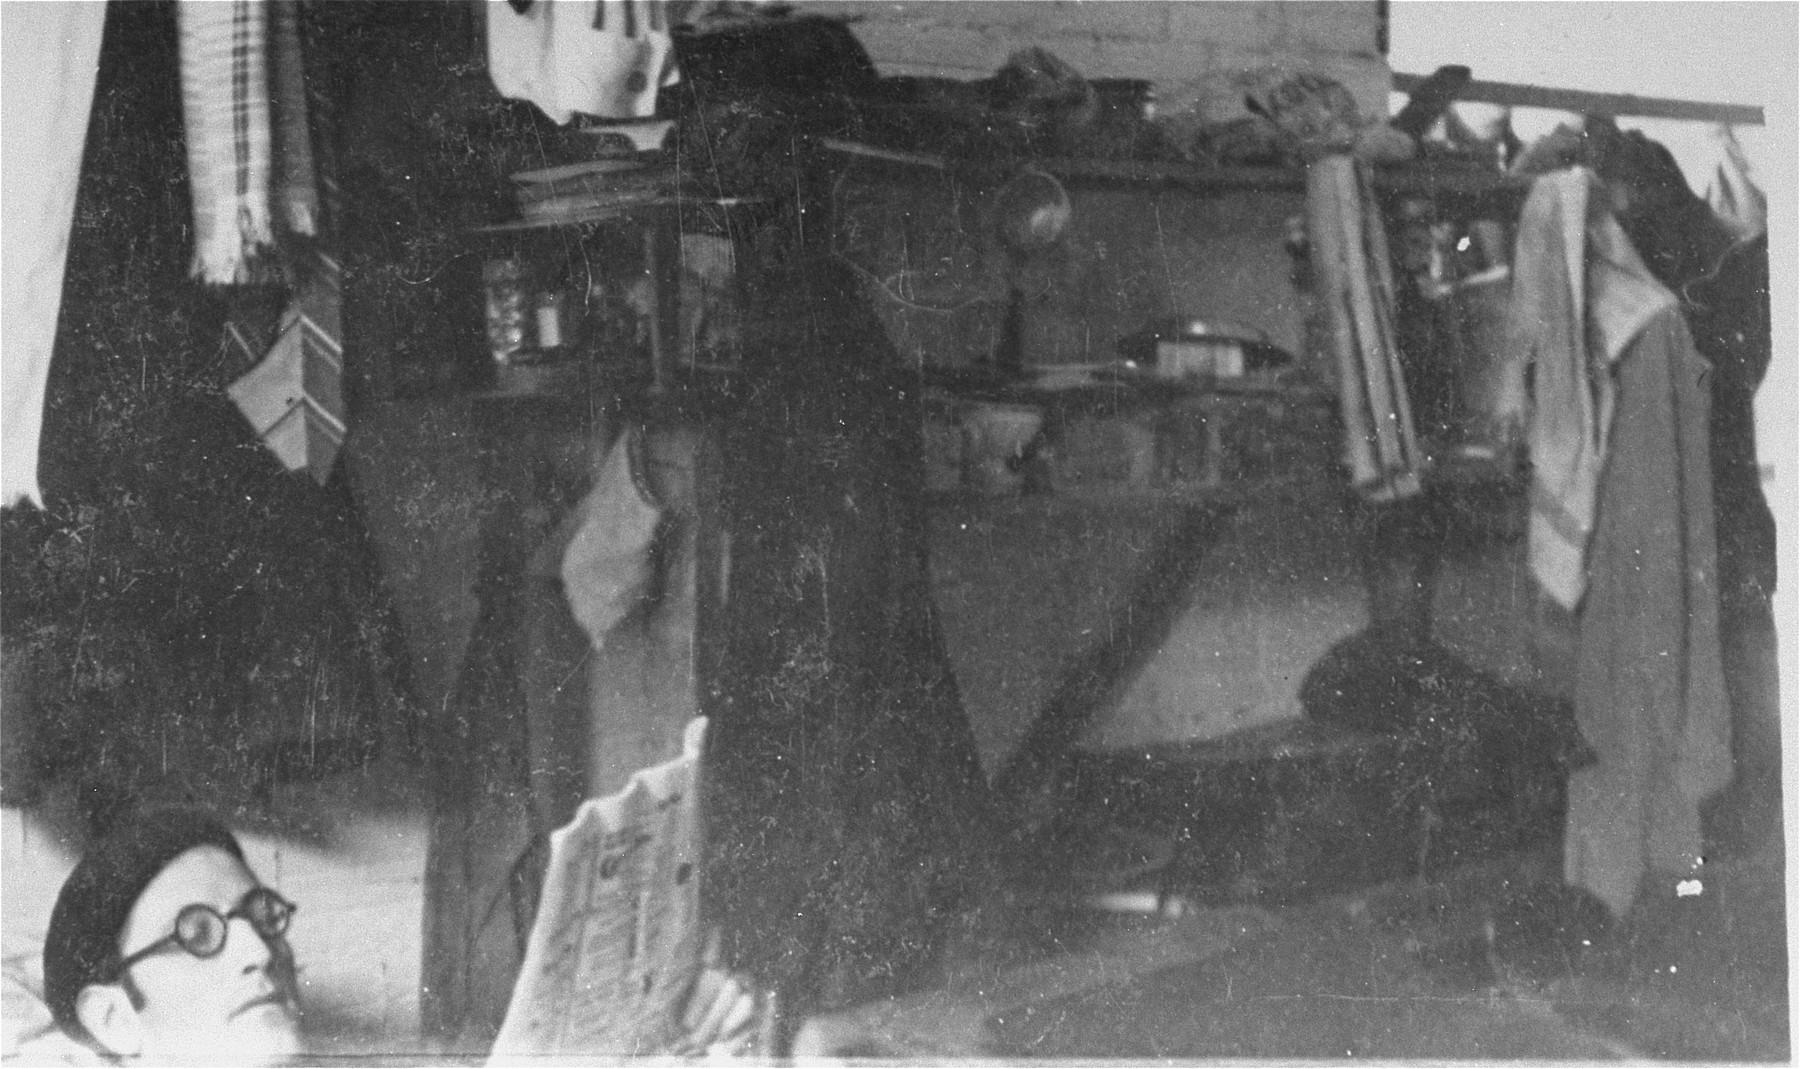 A prisoner in Les Milles reads in his barracks.